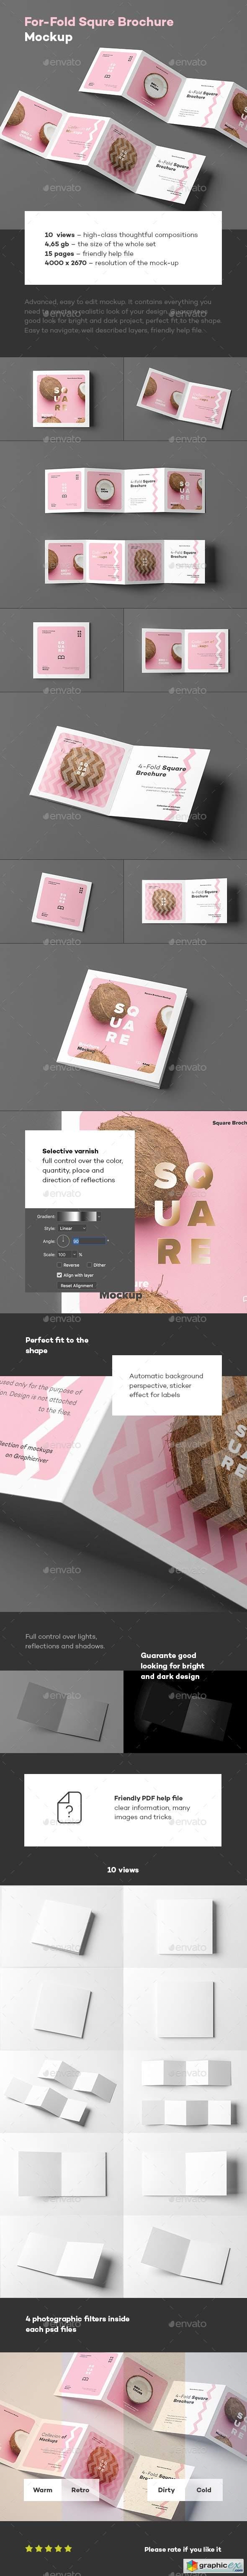 Four Fold Square Brochure Mock-up